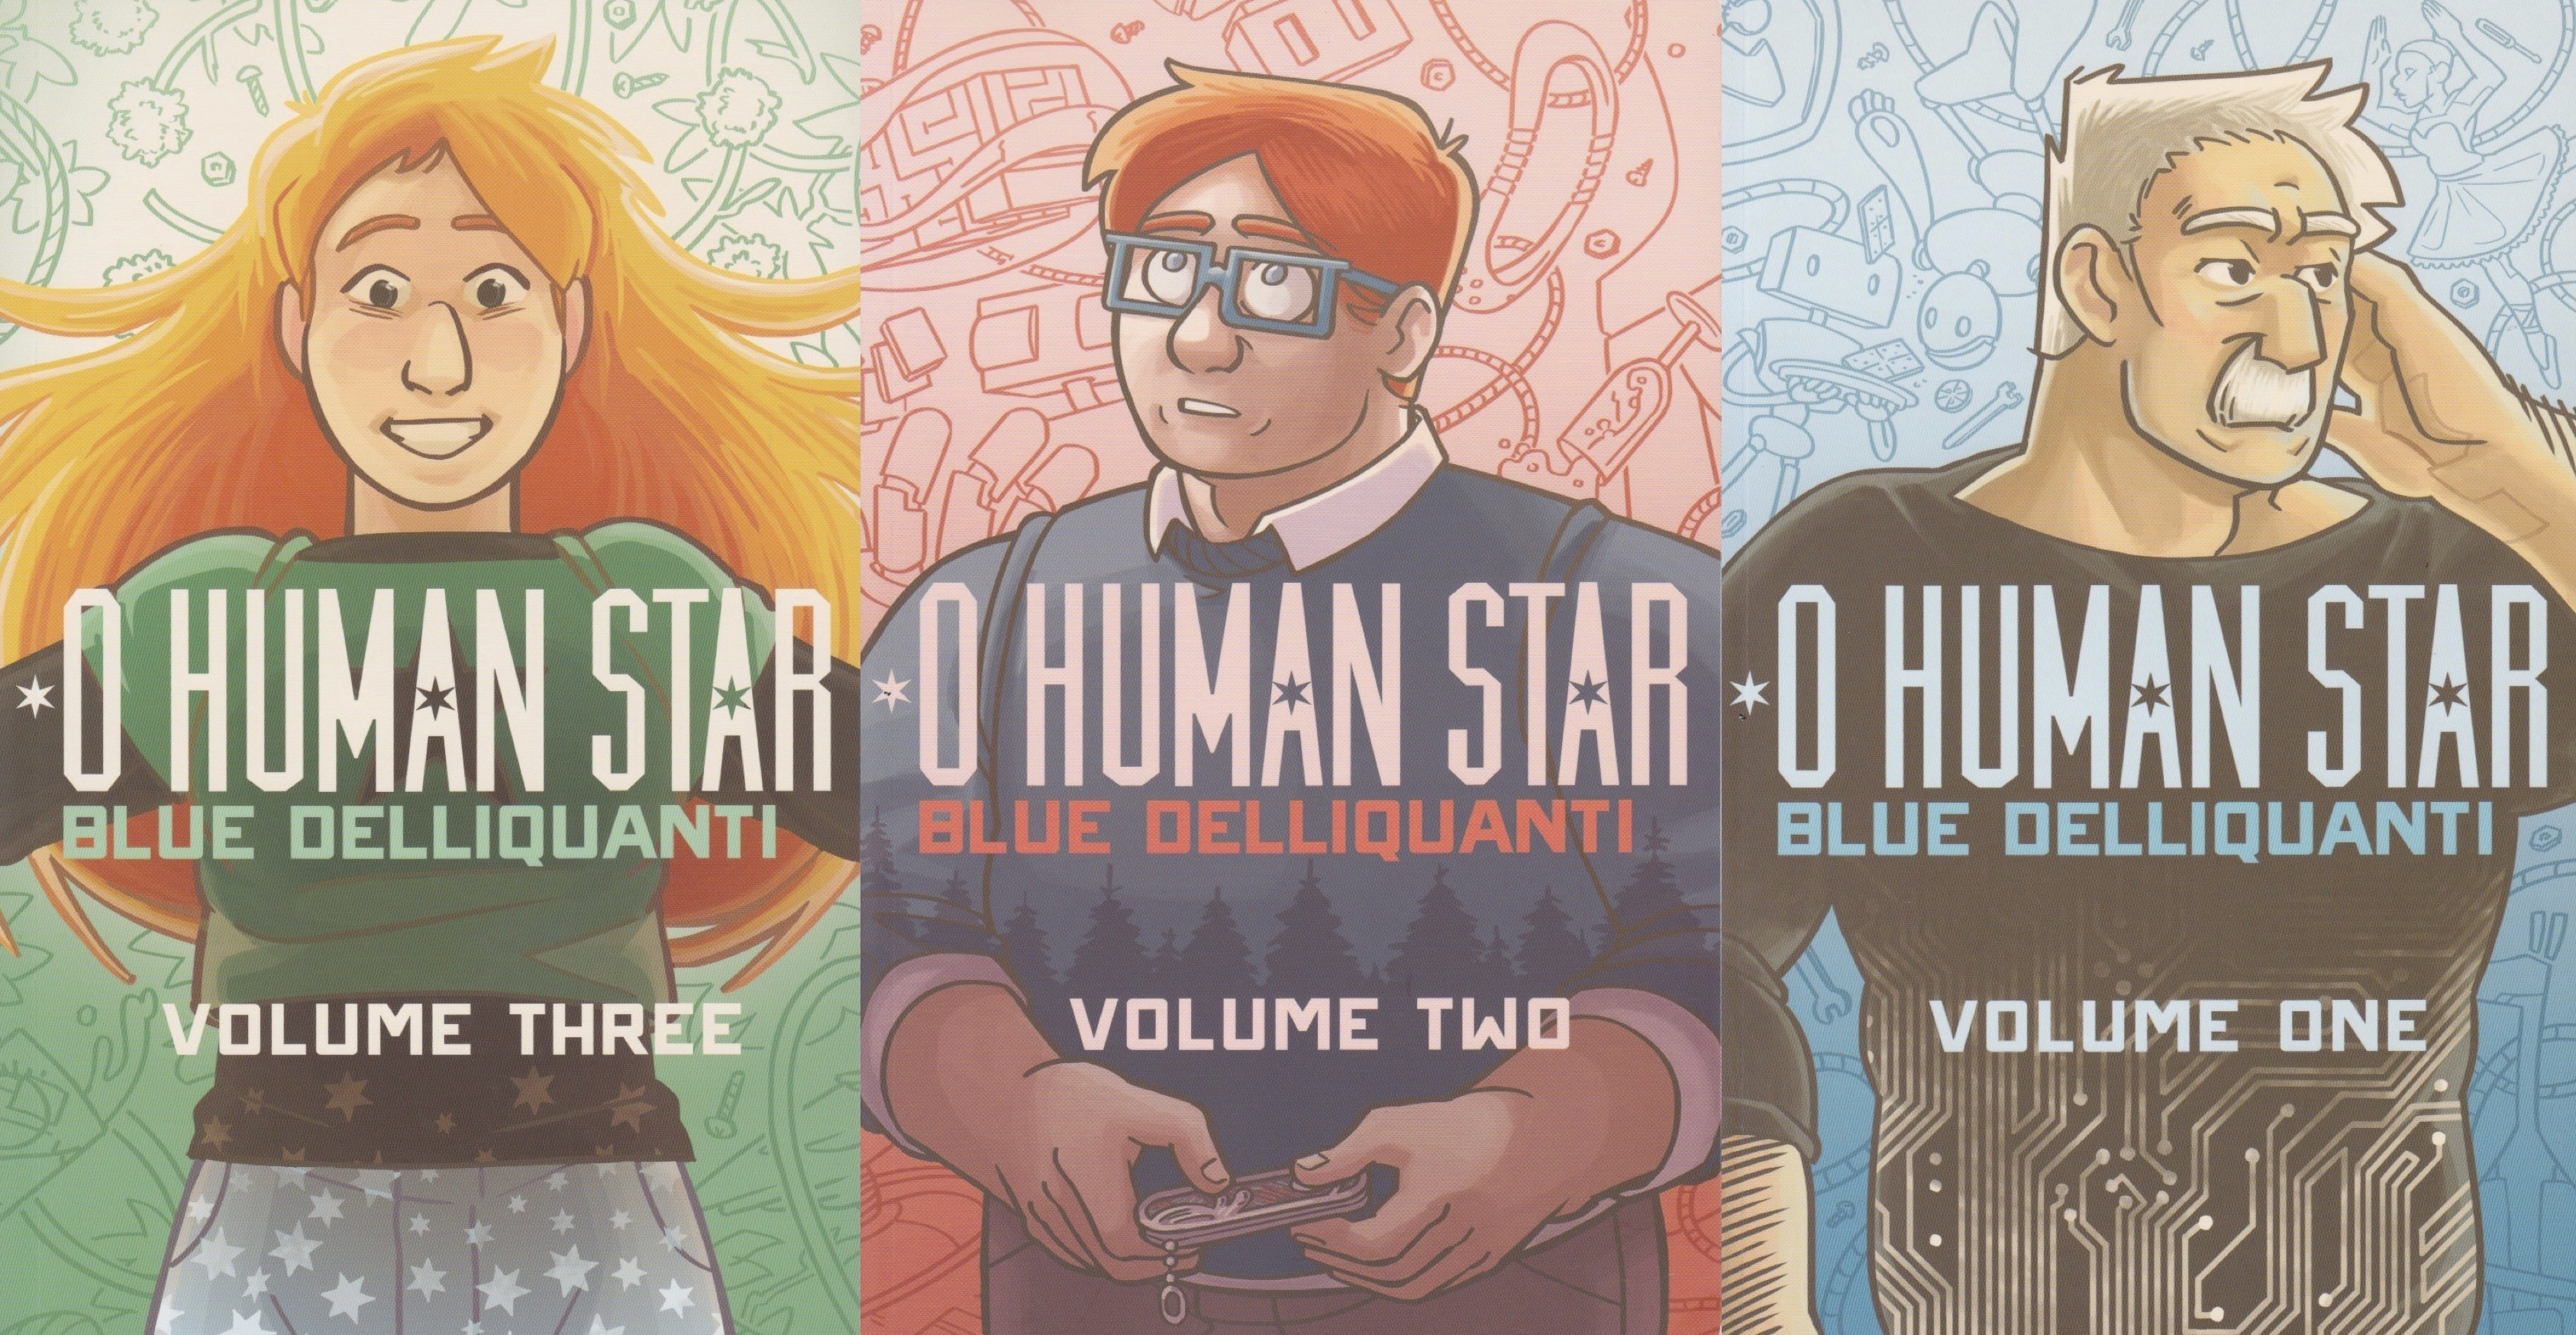 Featured image for O Human Star: Blue Delliquanti